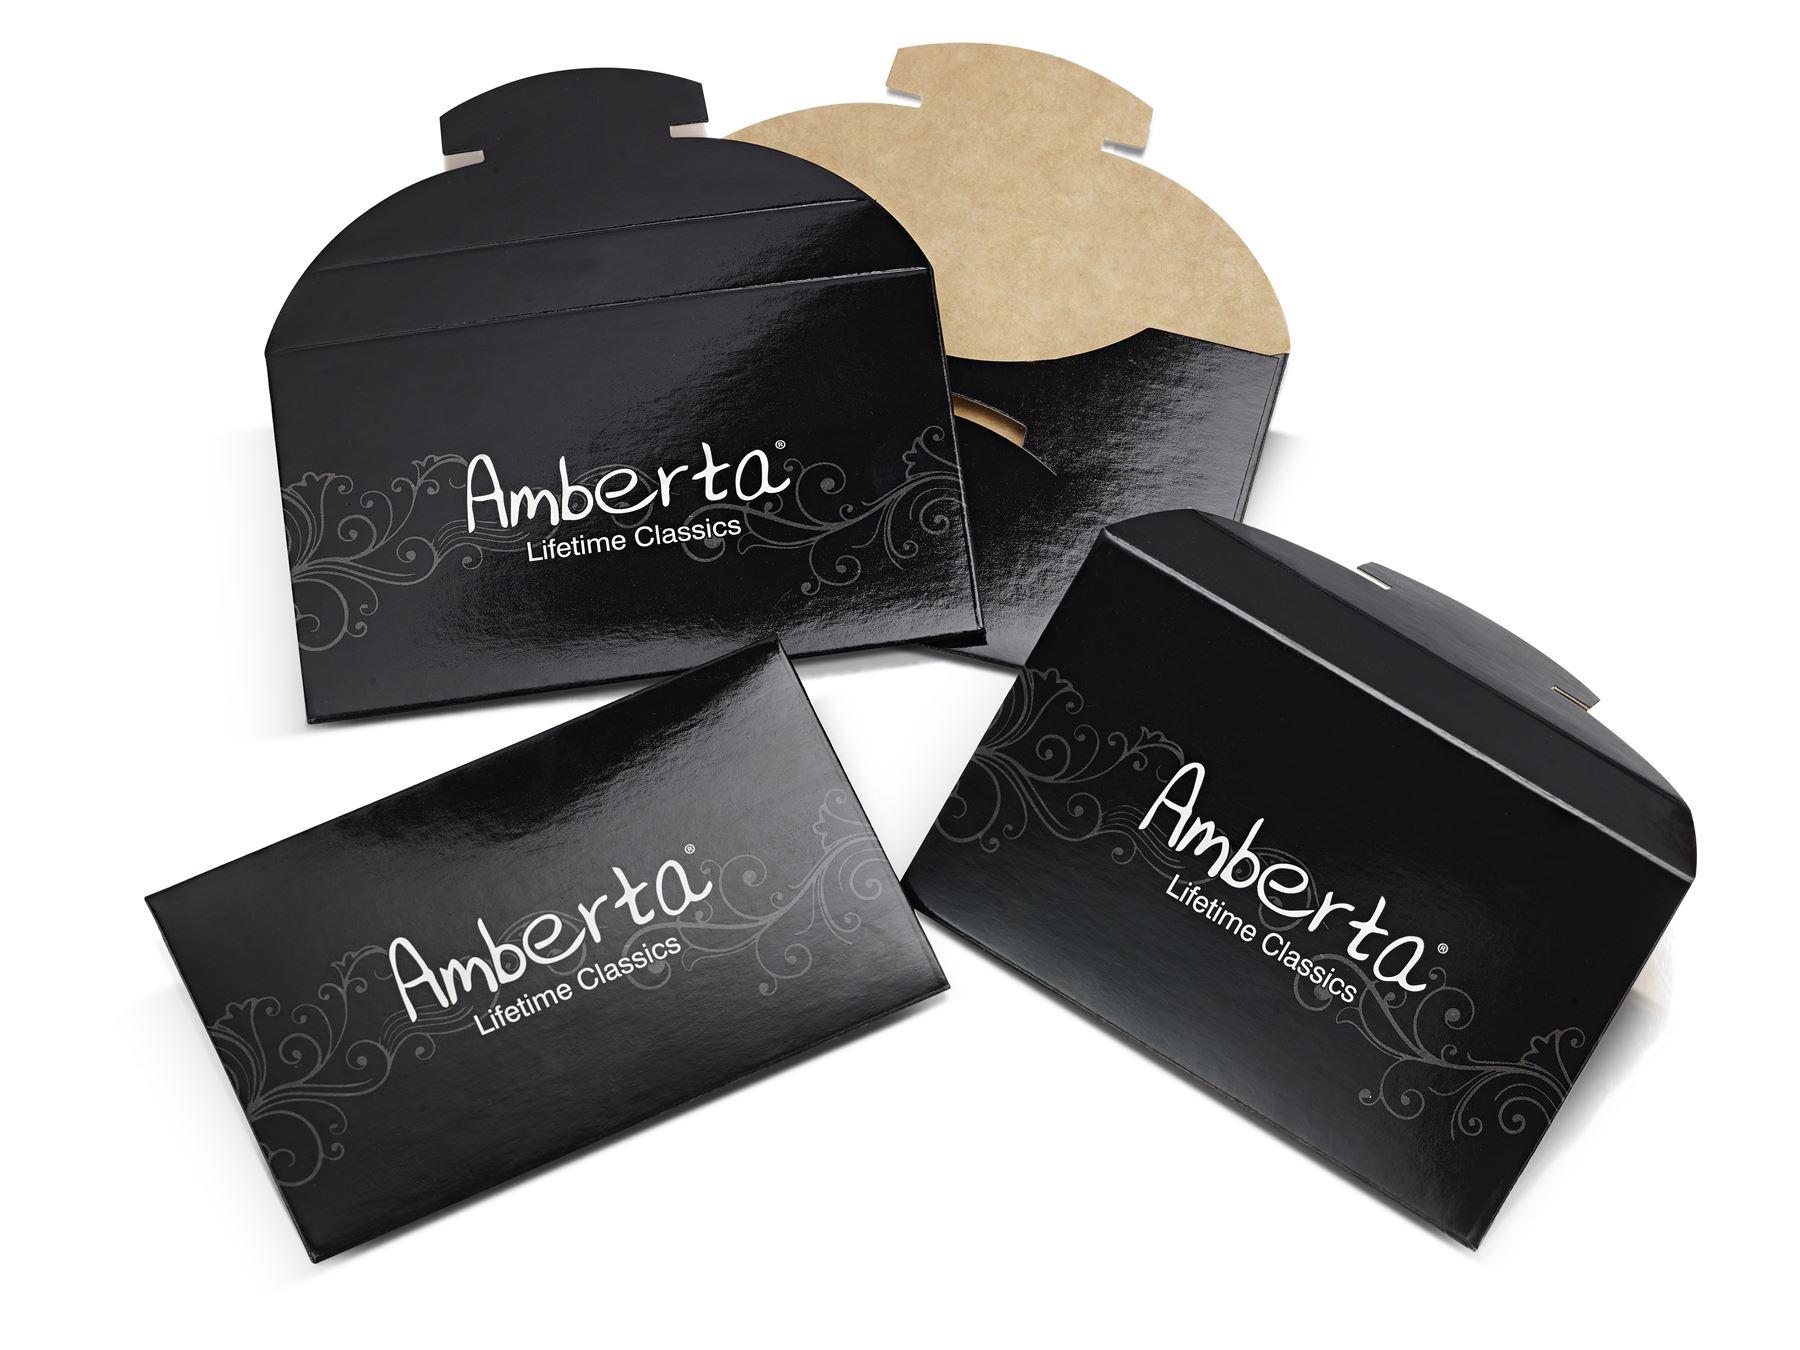 Amberta-Jewelry-925-Sterling-Silver-Adjustable-Bracelet-Italian-Bangle-for-Women thumbnail 10